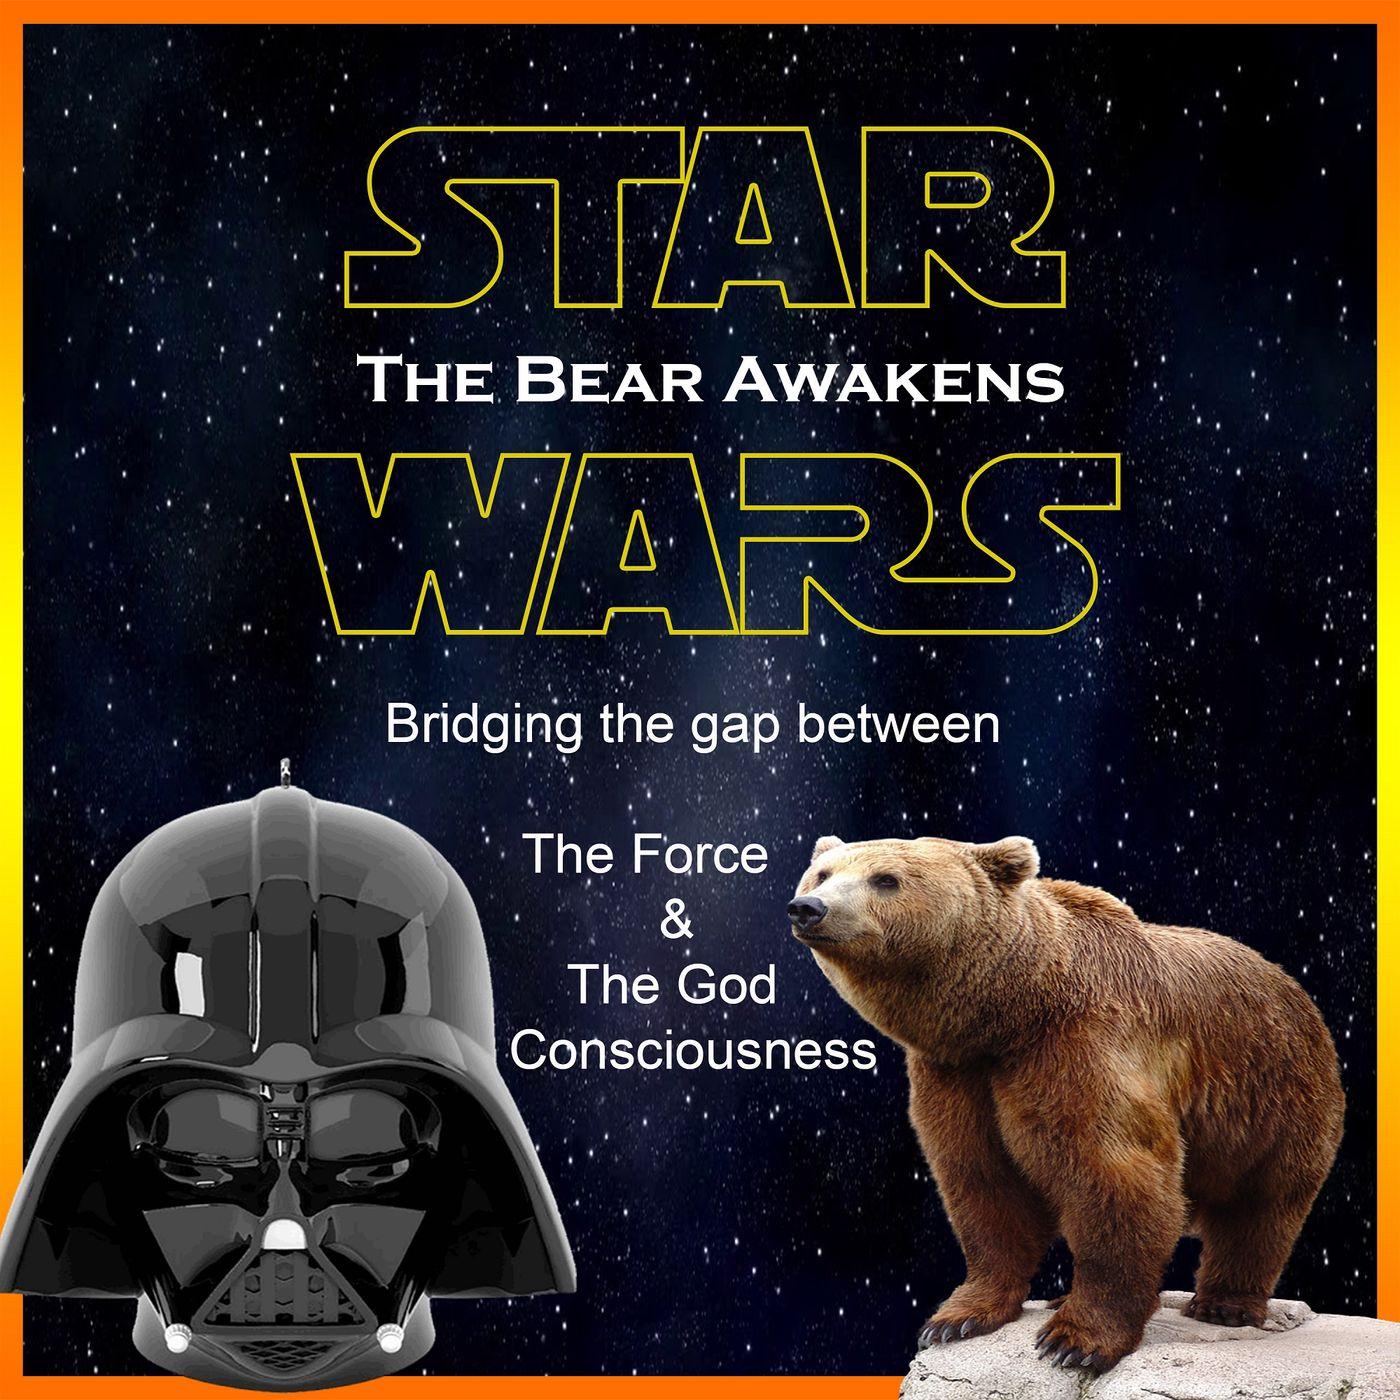 Star Wars - The Bear Awakens